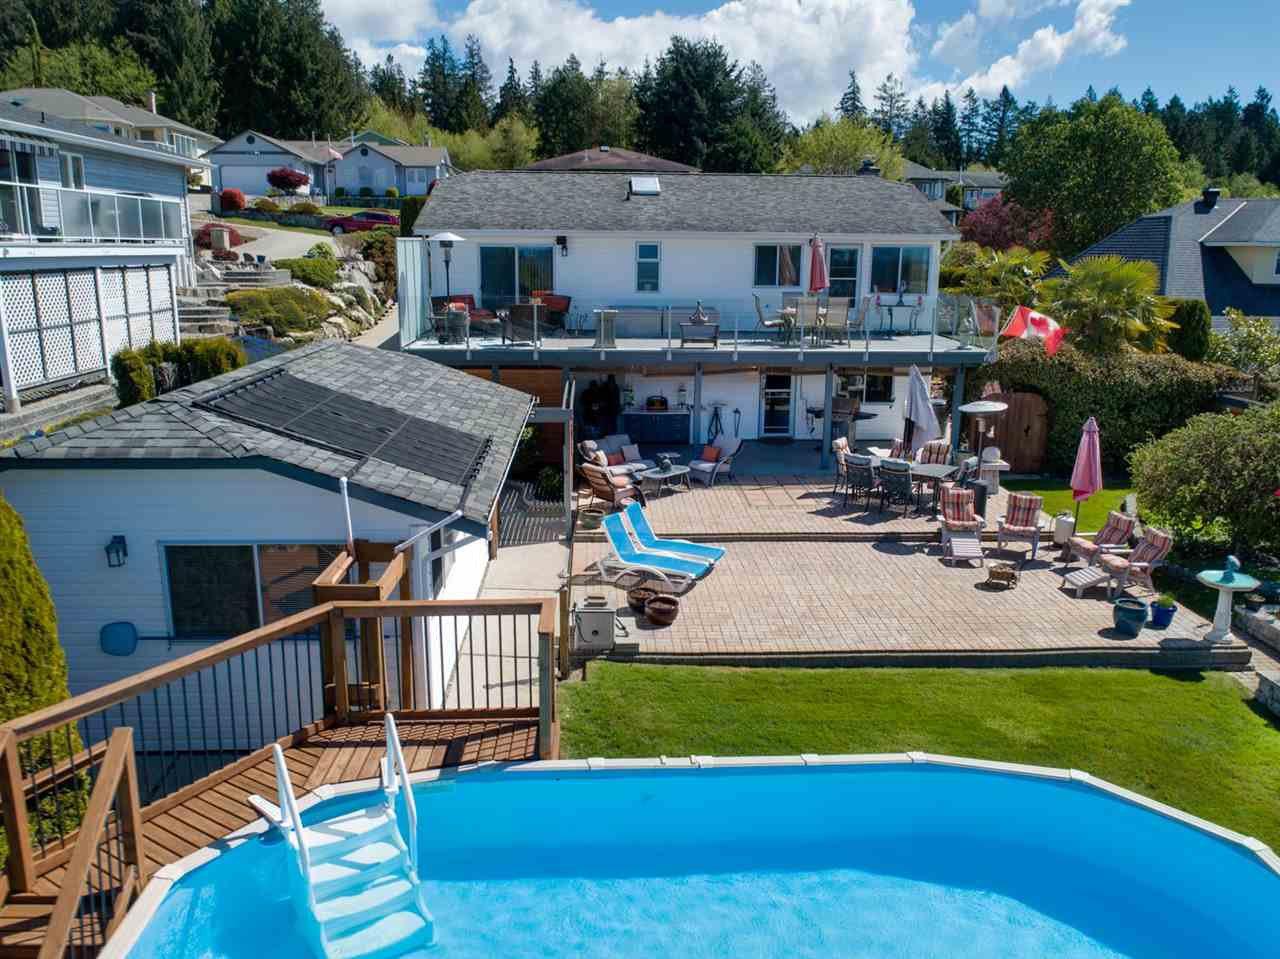 Photo 14: Photos: 4983 ARBUTUS Road in Sechelt: Sechelt District House for sale (Sunshine Coast)  : MLS®# R2427502